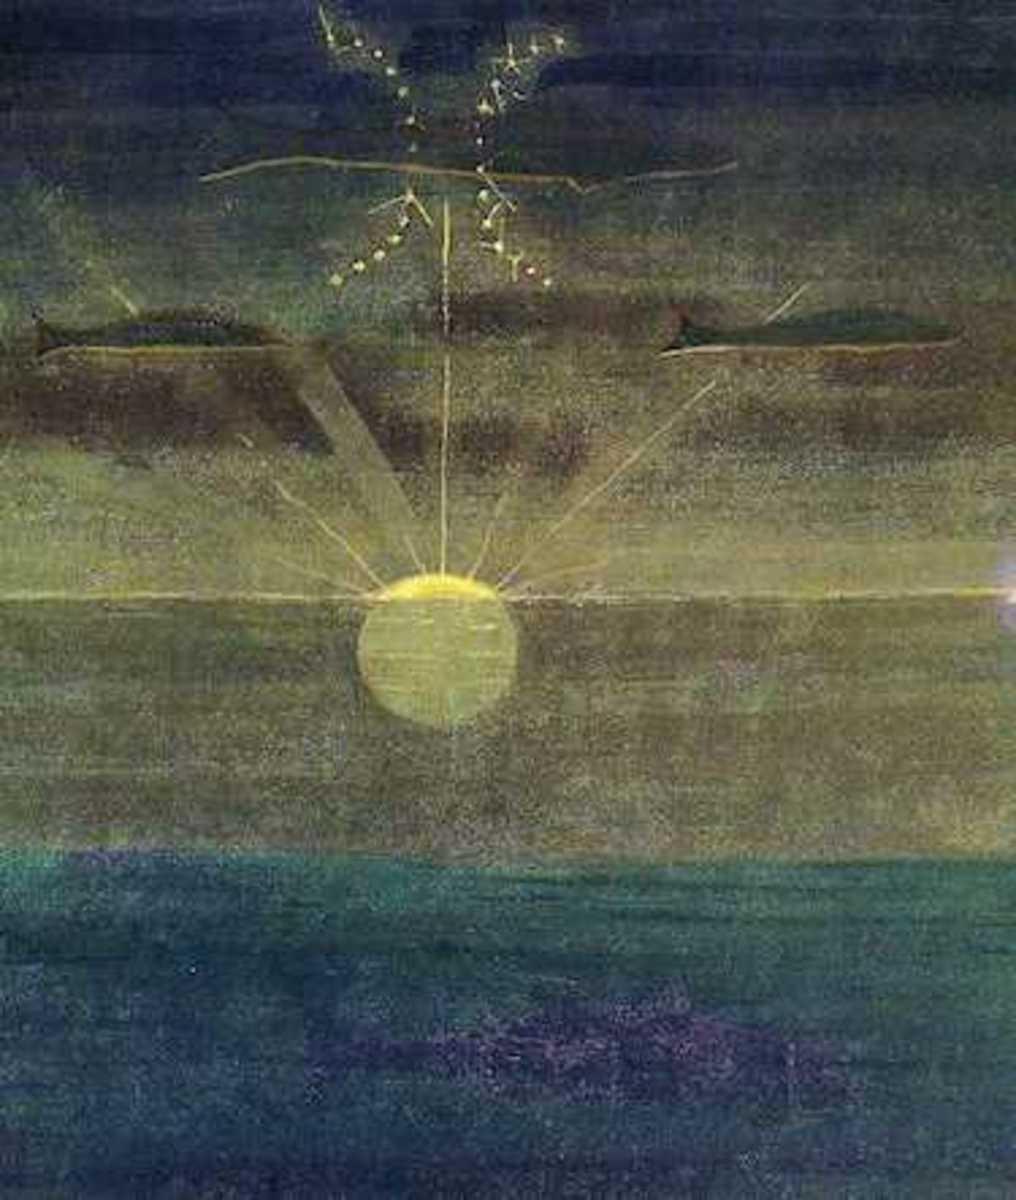 Žuvys (Pisces) by Mikalojus Konstantinas Čiurlionis.